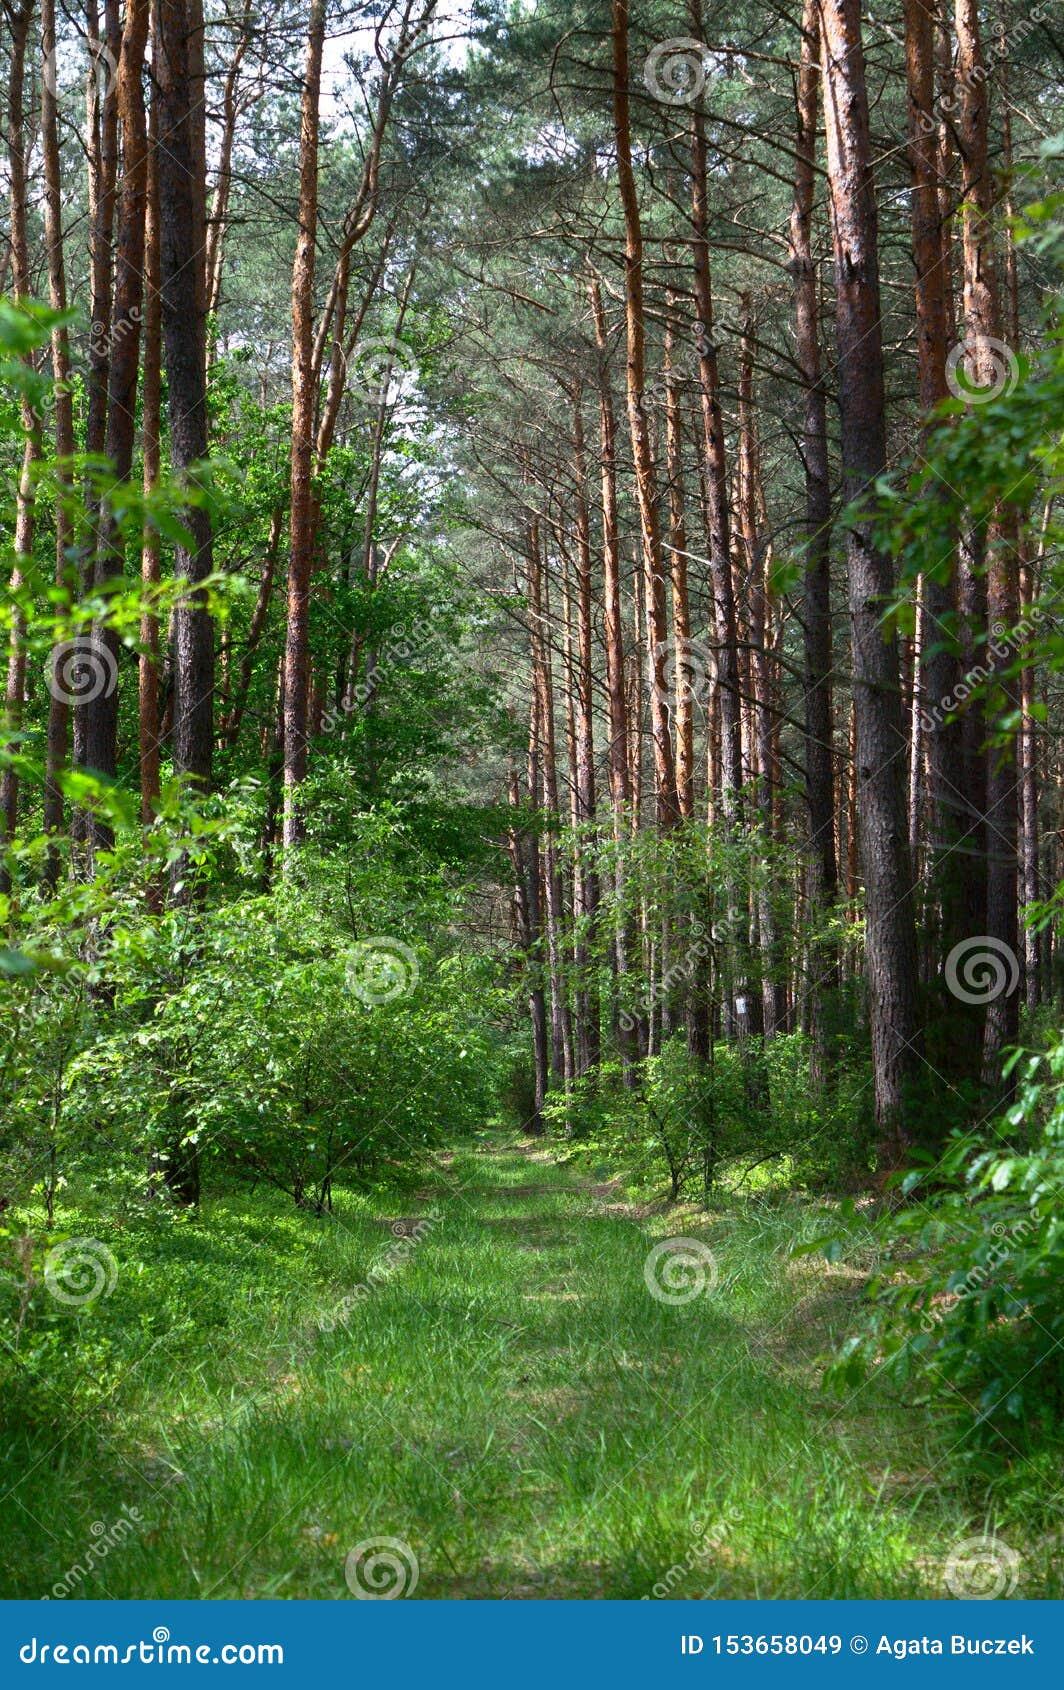 Grasweg in einem Kiefernwald